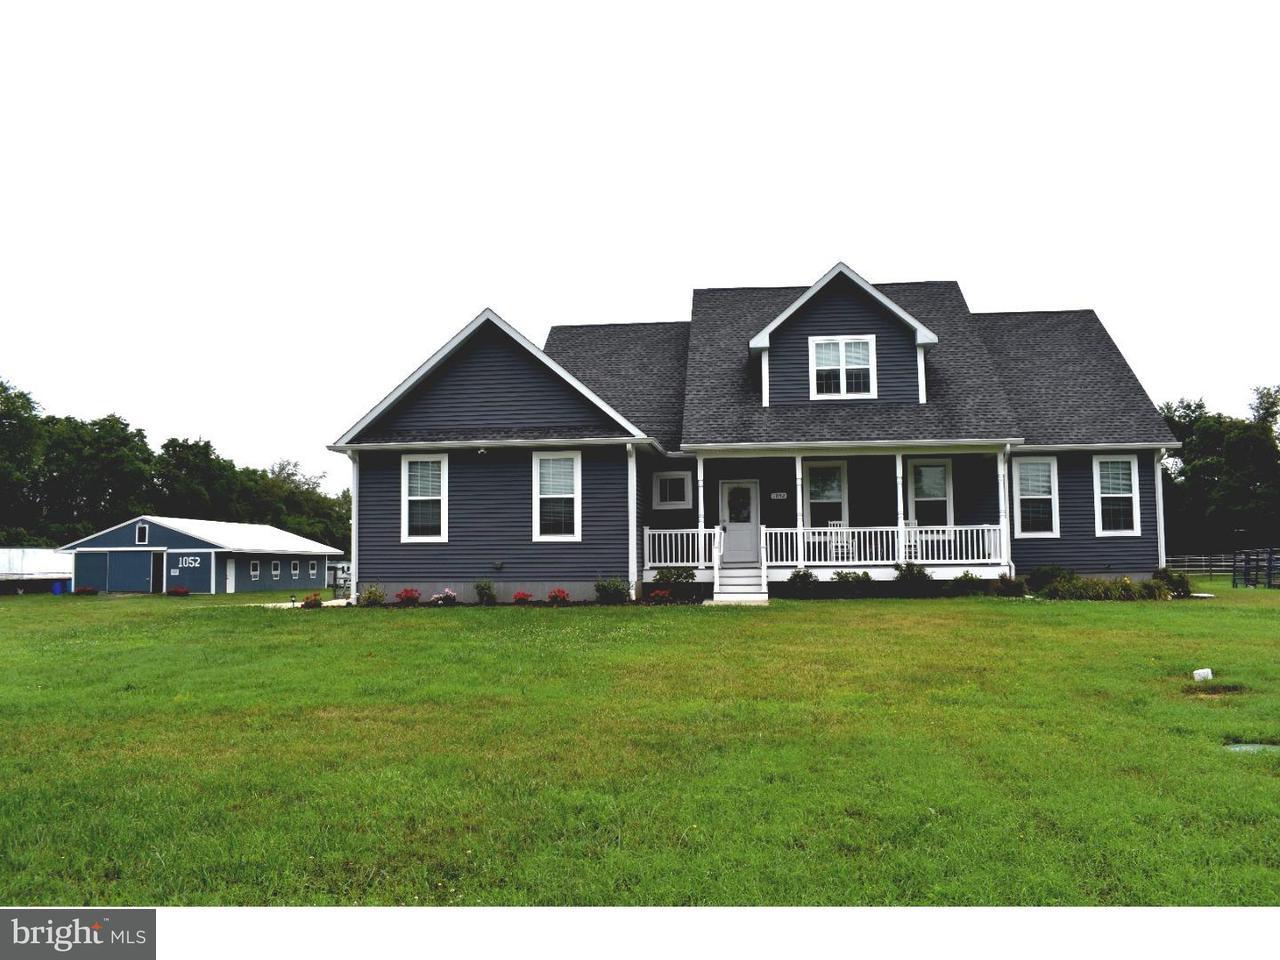 农场 为 销售 在 1052 OLD WHITE HORSE PIKE Waterford Works, 新泽西州 08089 美国